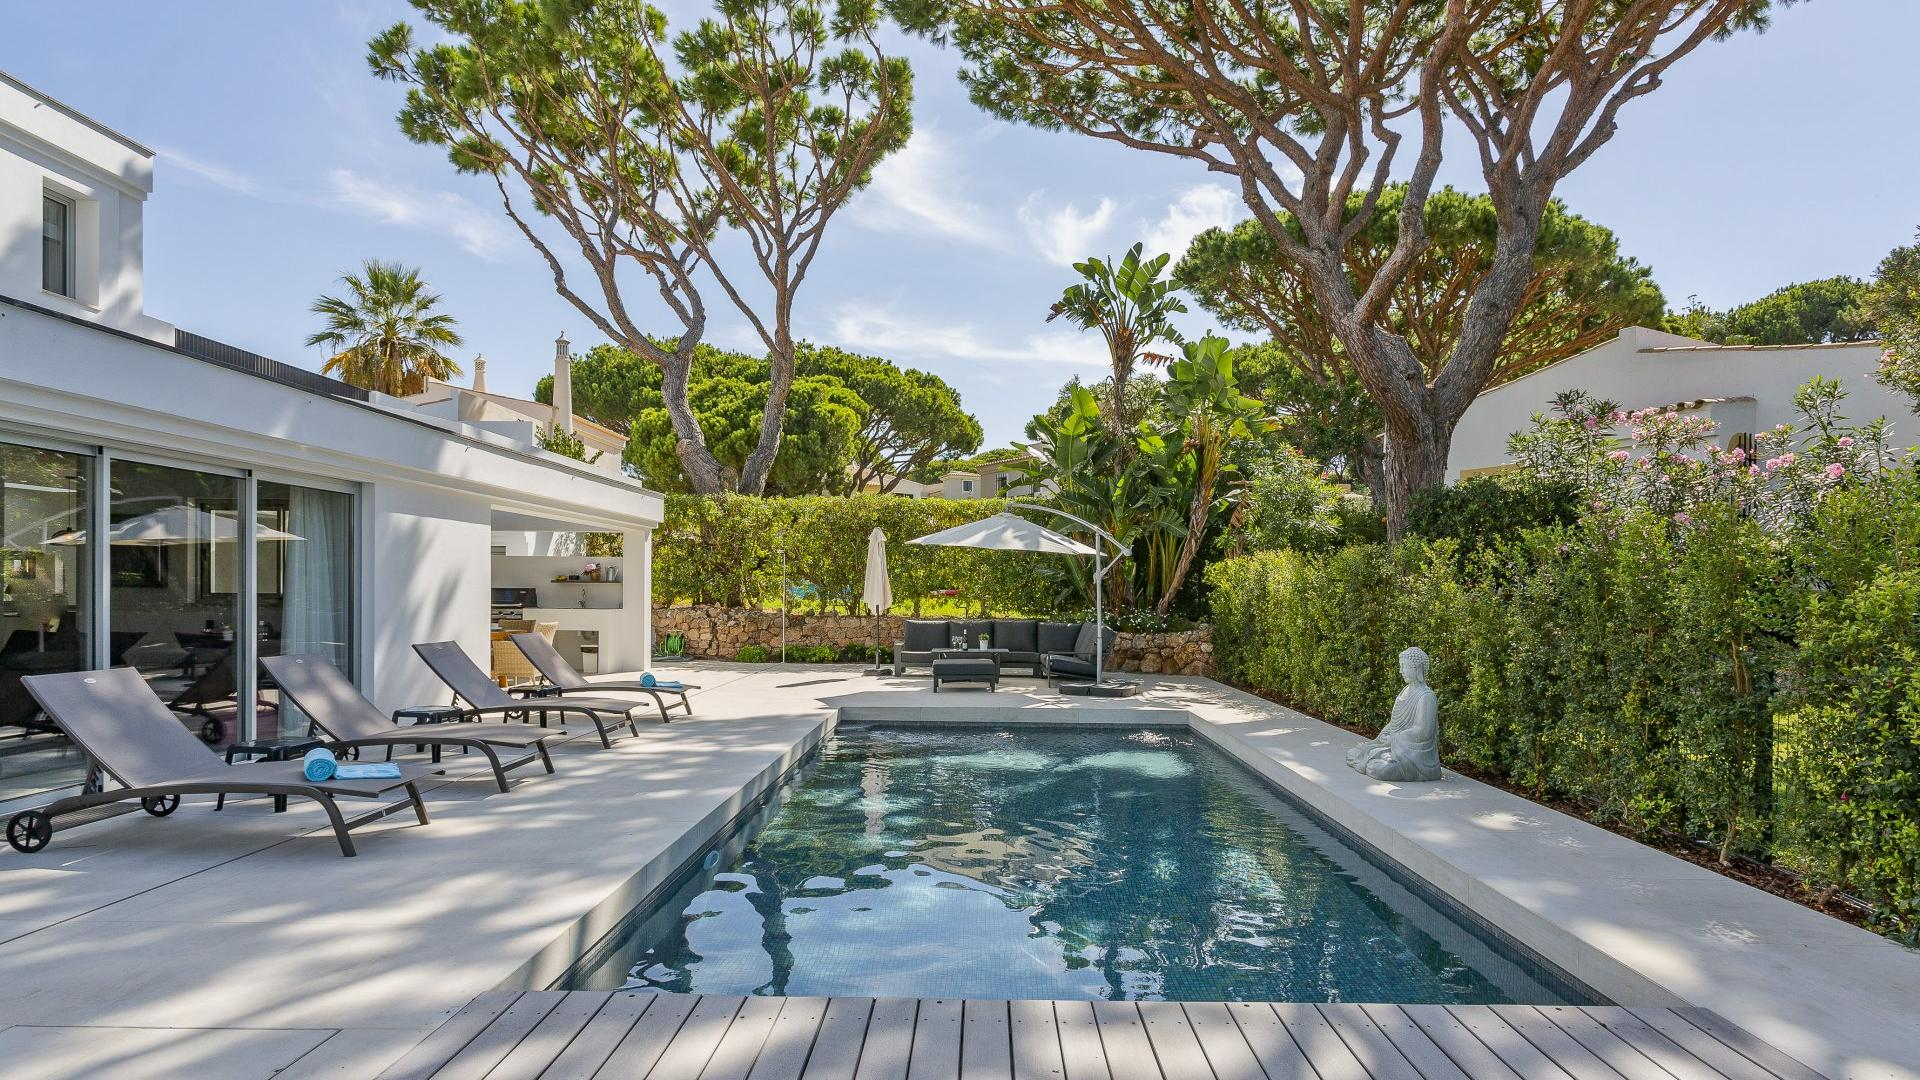 Casa Marice - Dunas Douradas, Vale do Lobo, Algarve - Casa_Marice_Outdoors_2.jpg